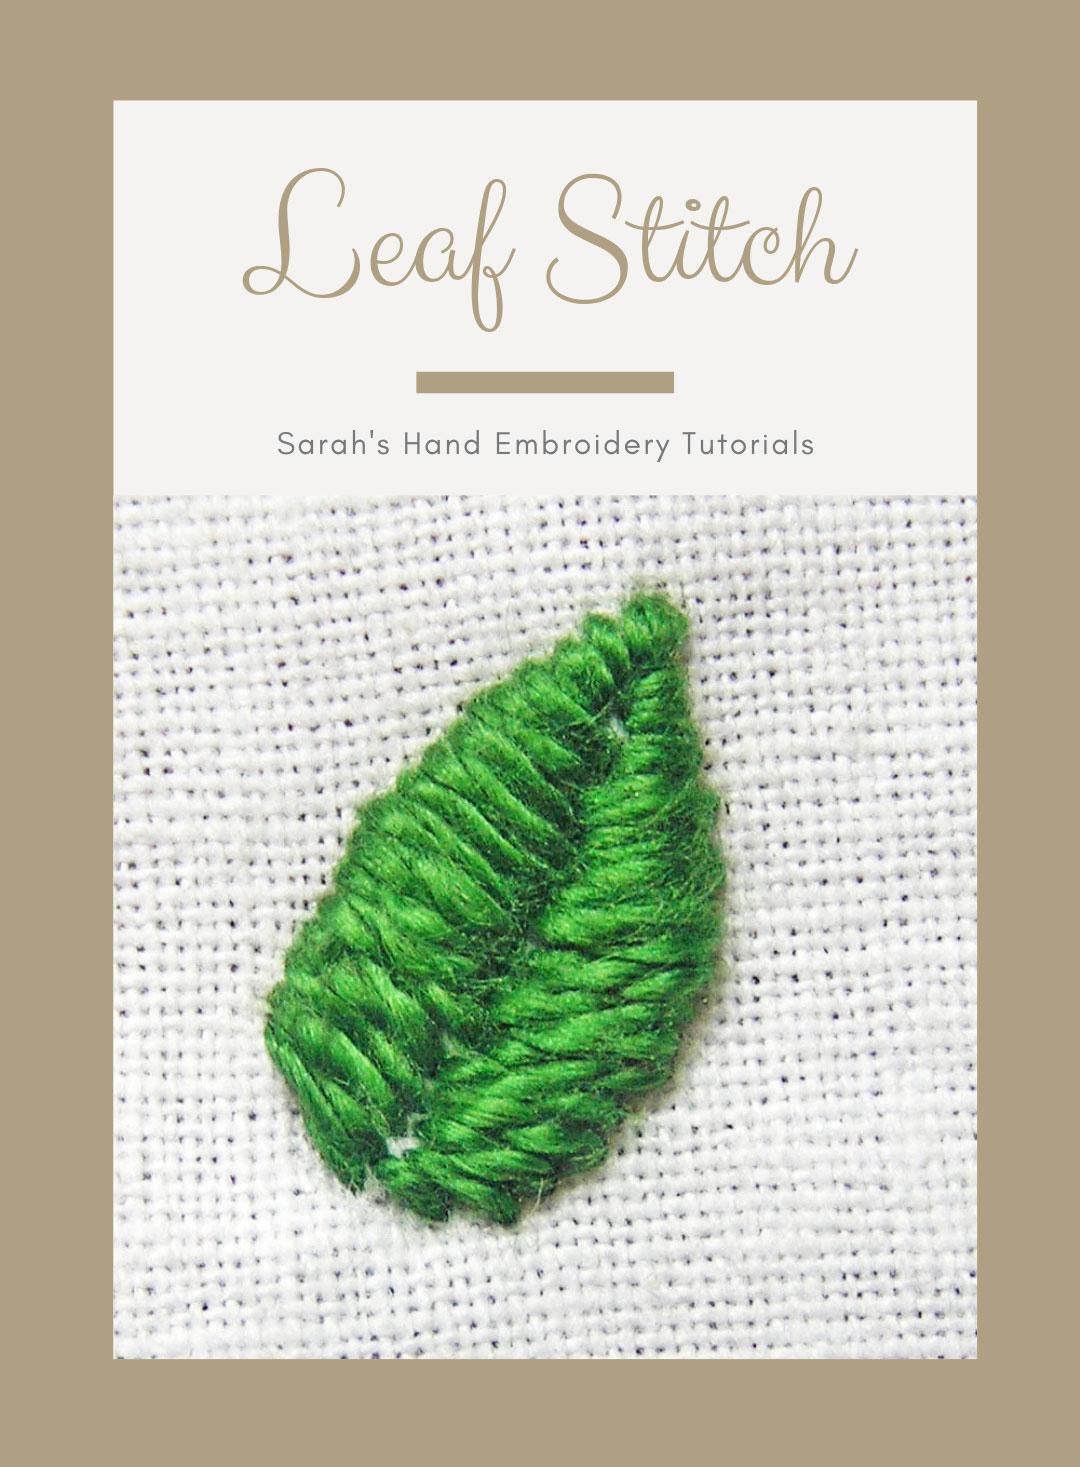 Leaf Stitch   Sarah's Hand Embroidery Tutorials